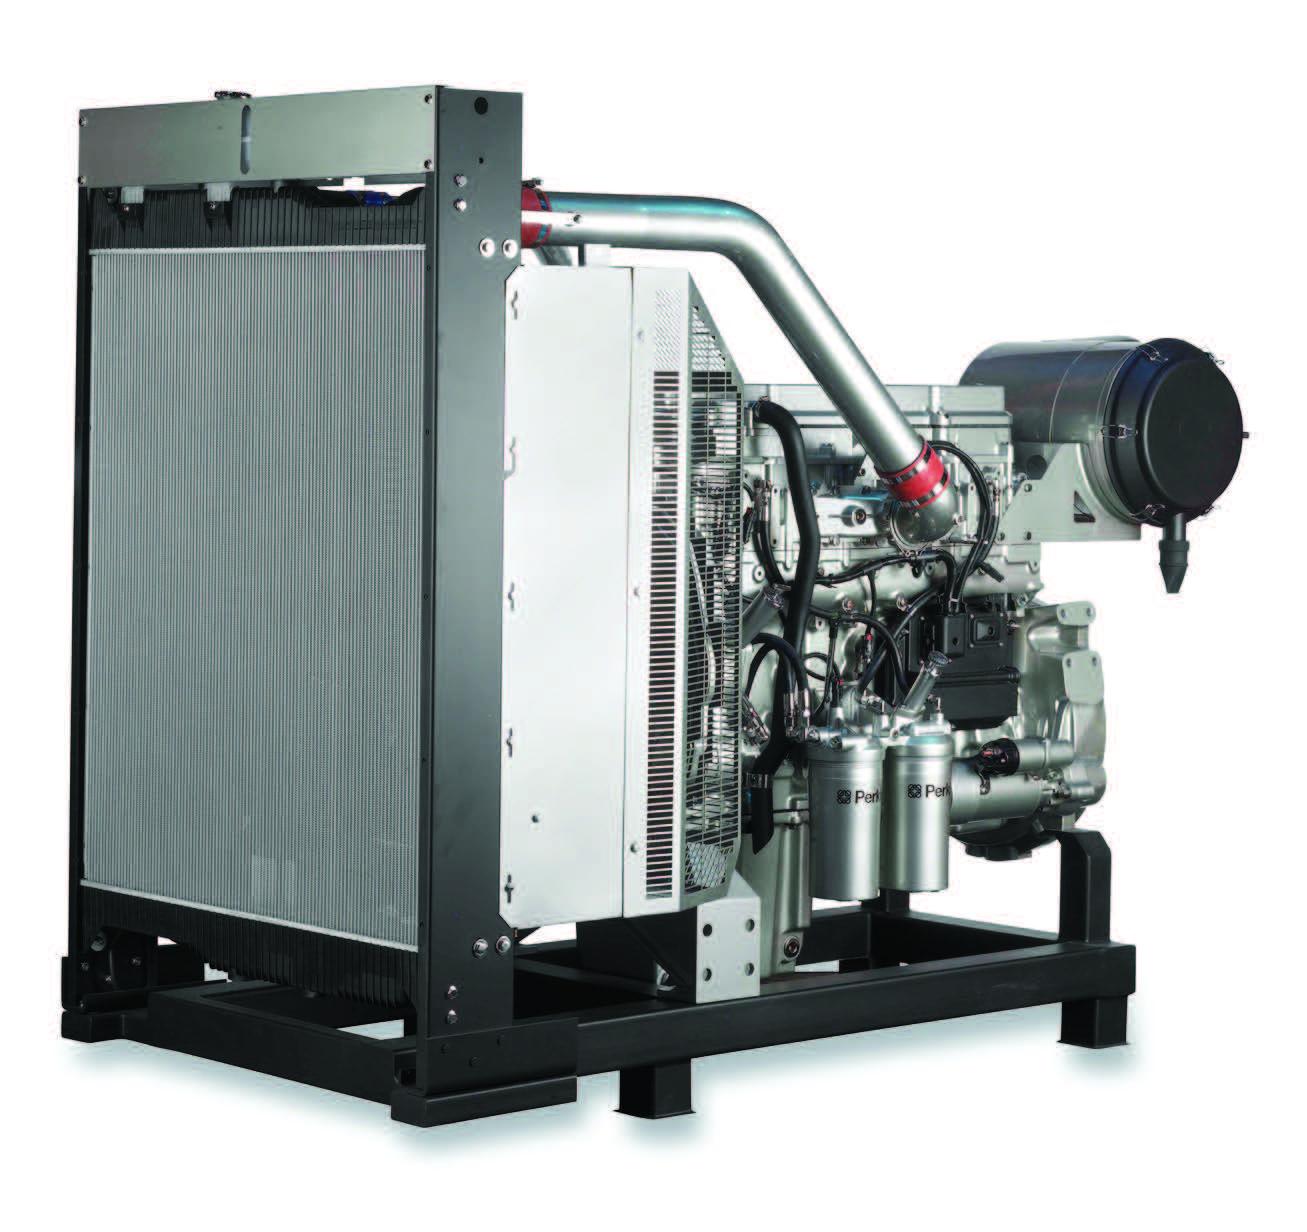 2206D-E13TAG3 Diesel Engine - ElectropaK